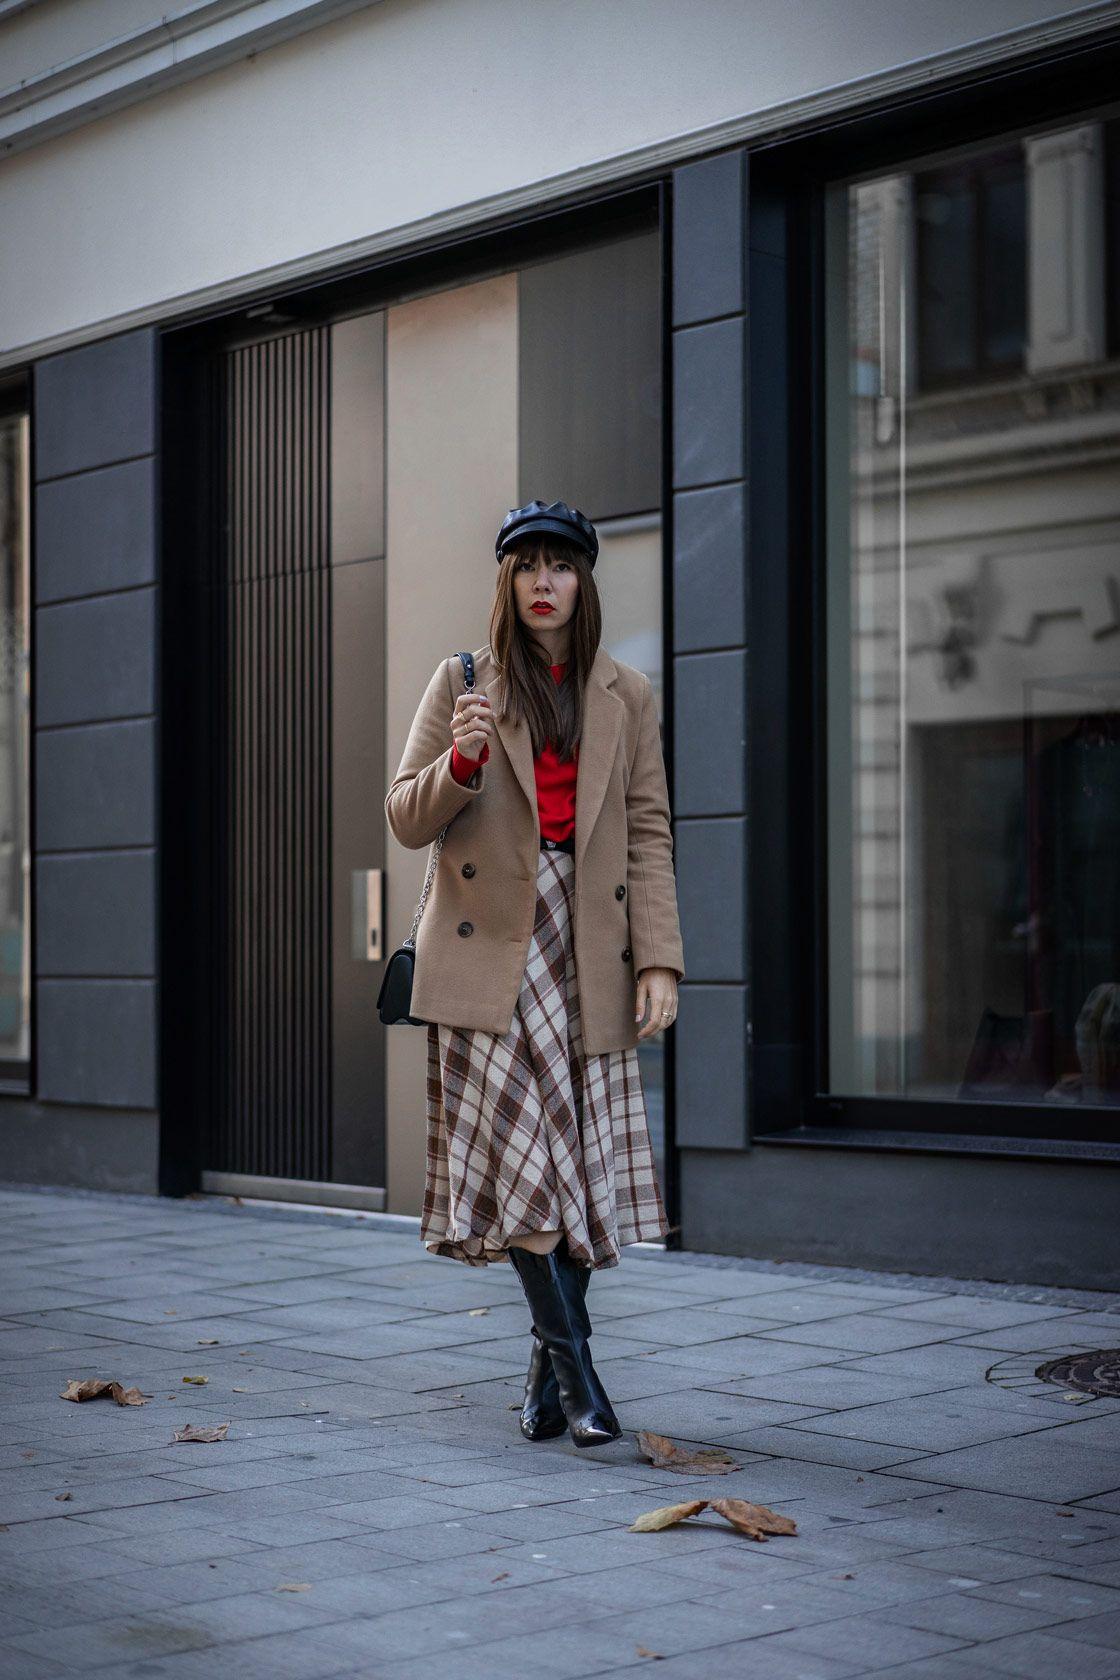 SLFMag - Thigh-High Boots + short/mini dress + Coat. Street